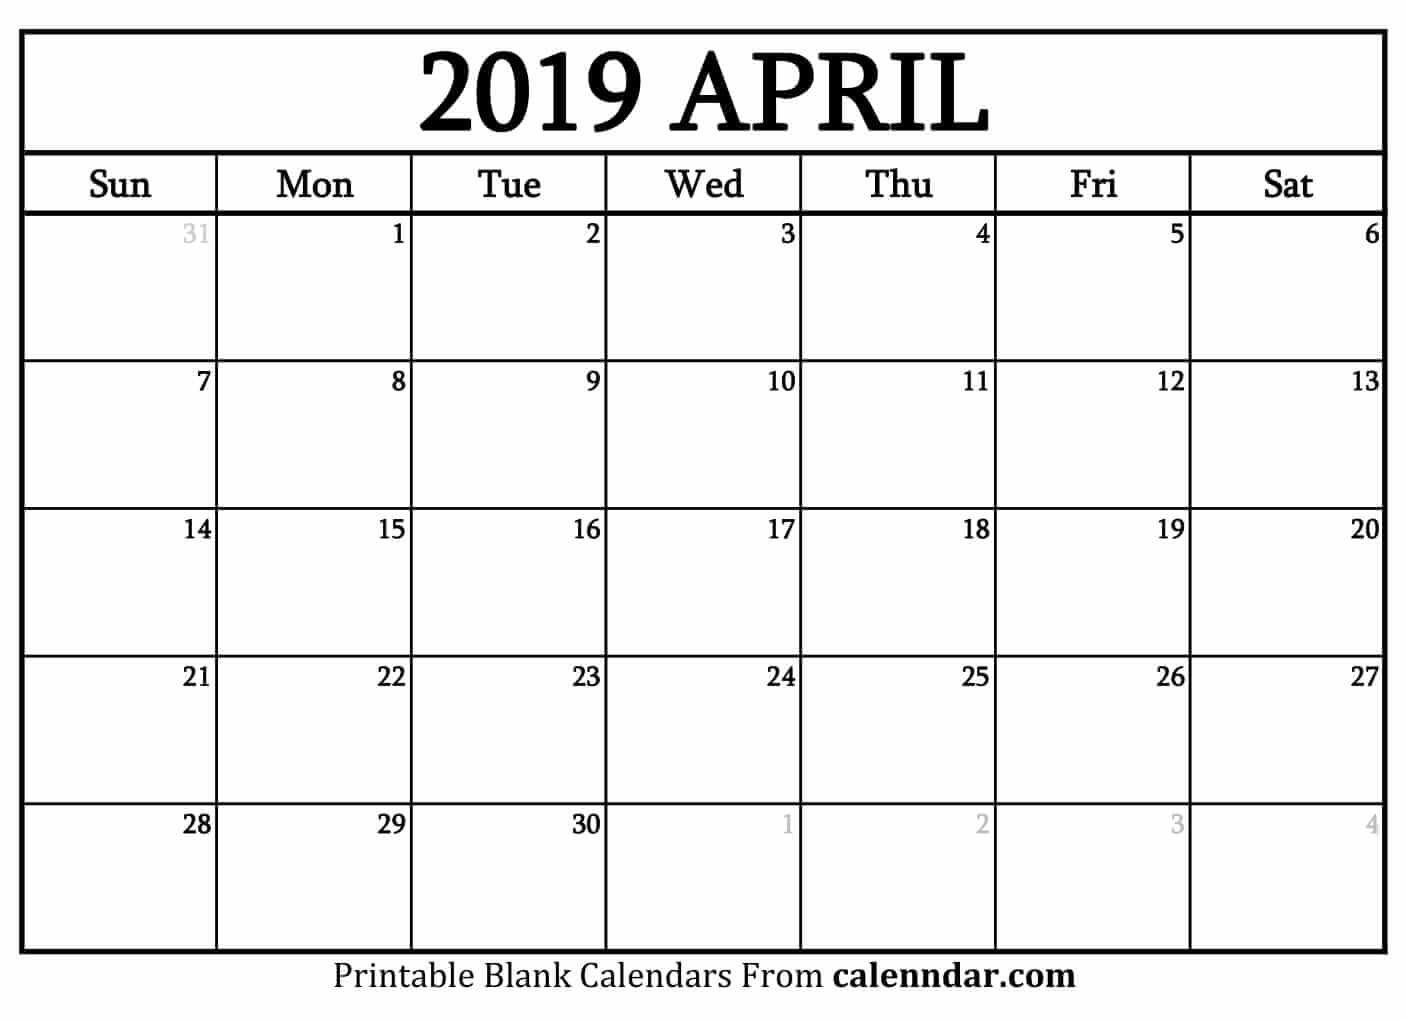 Blank April 2019 Calendar Templates - Calenndar Calendar Of 2019 April